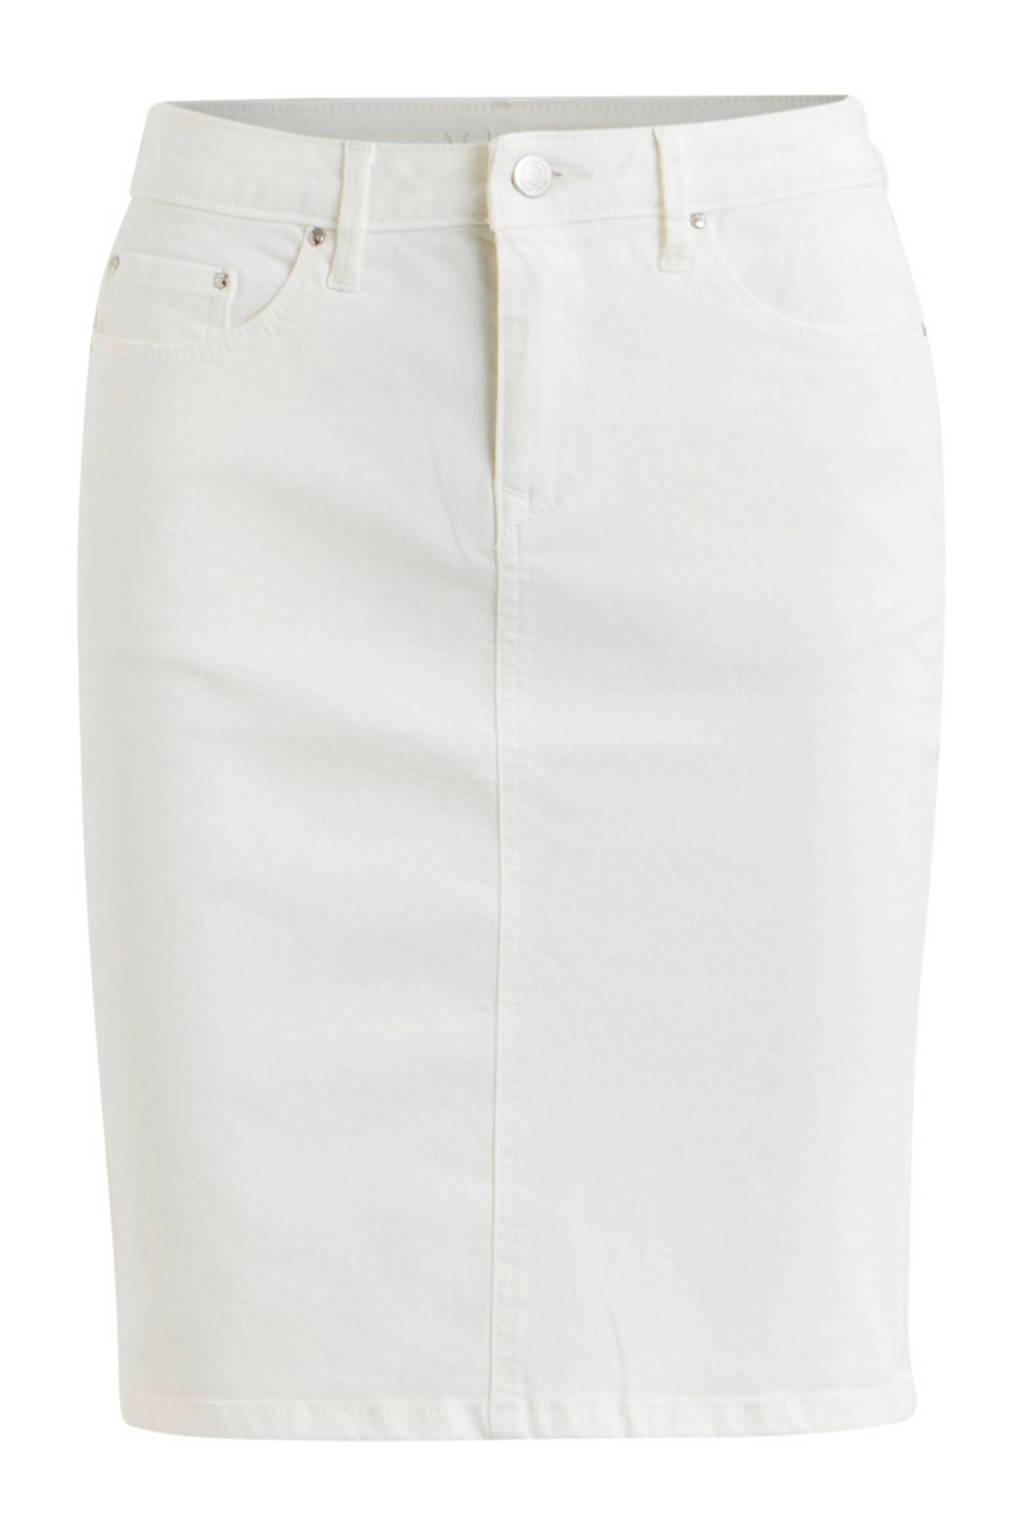 VILA spijkerrok wit, Wit